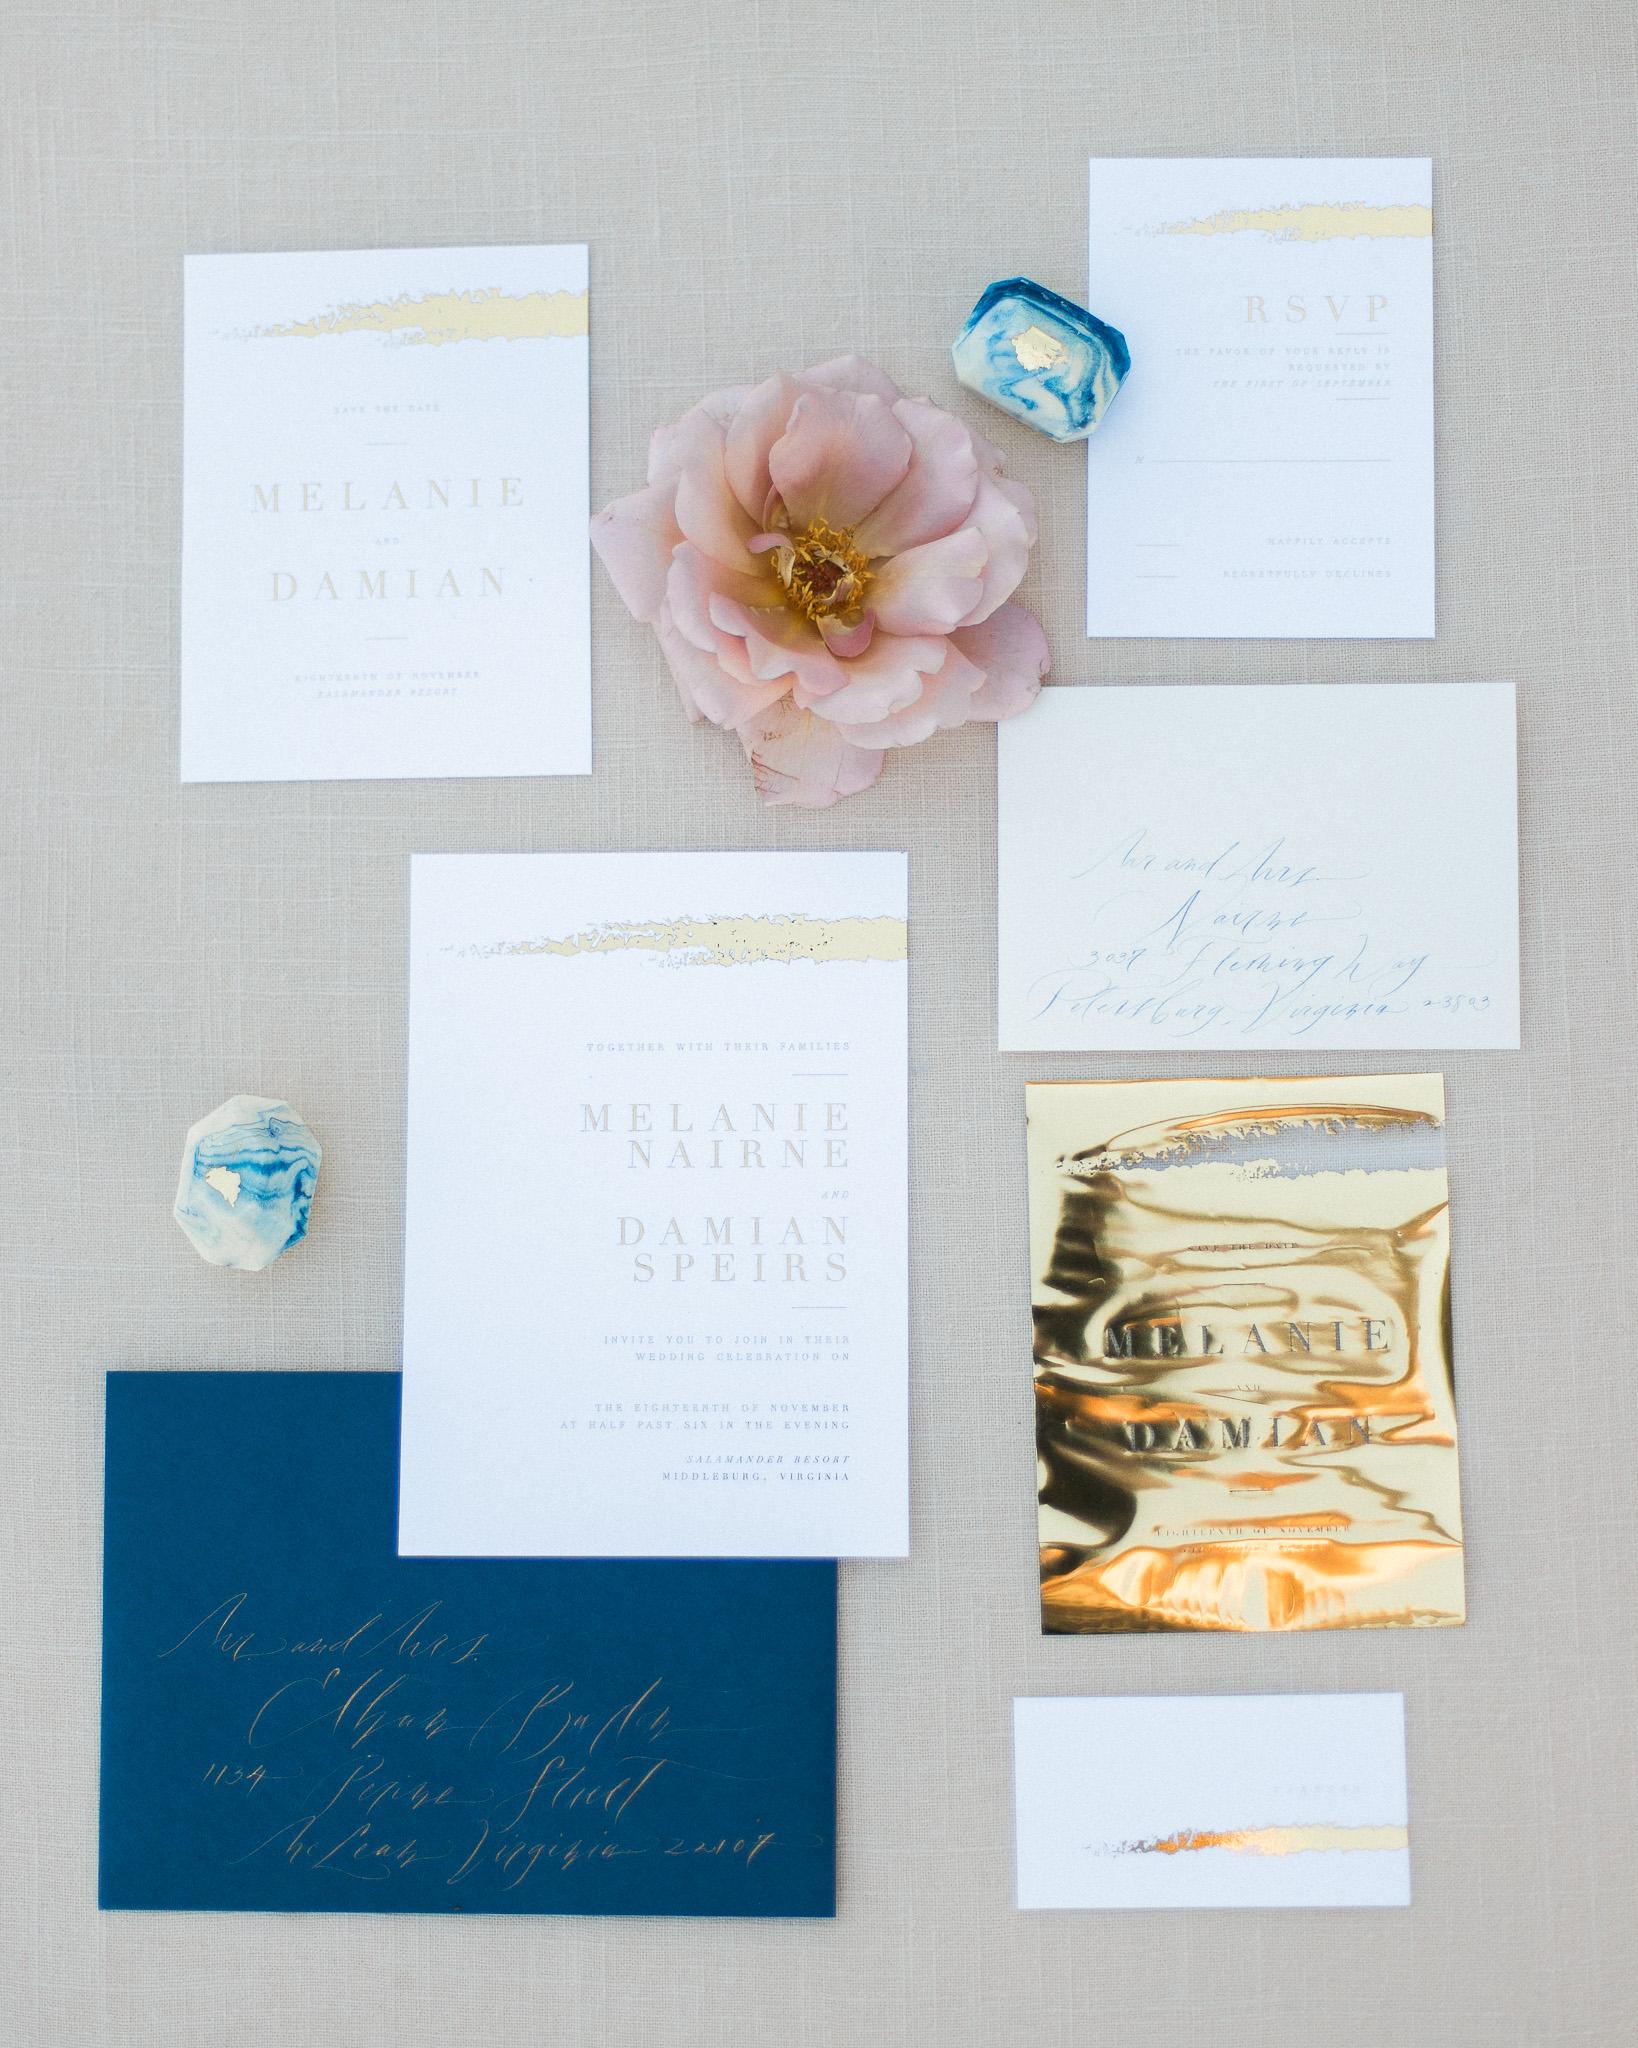 Julia-ha-calligraphy-wedding-invitation-suite